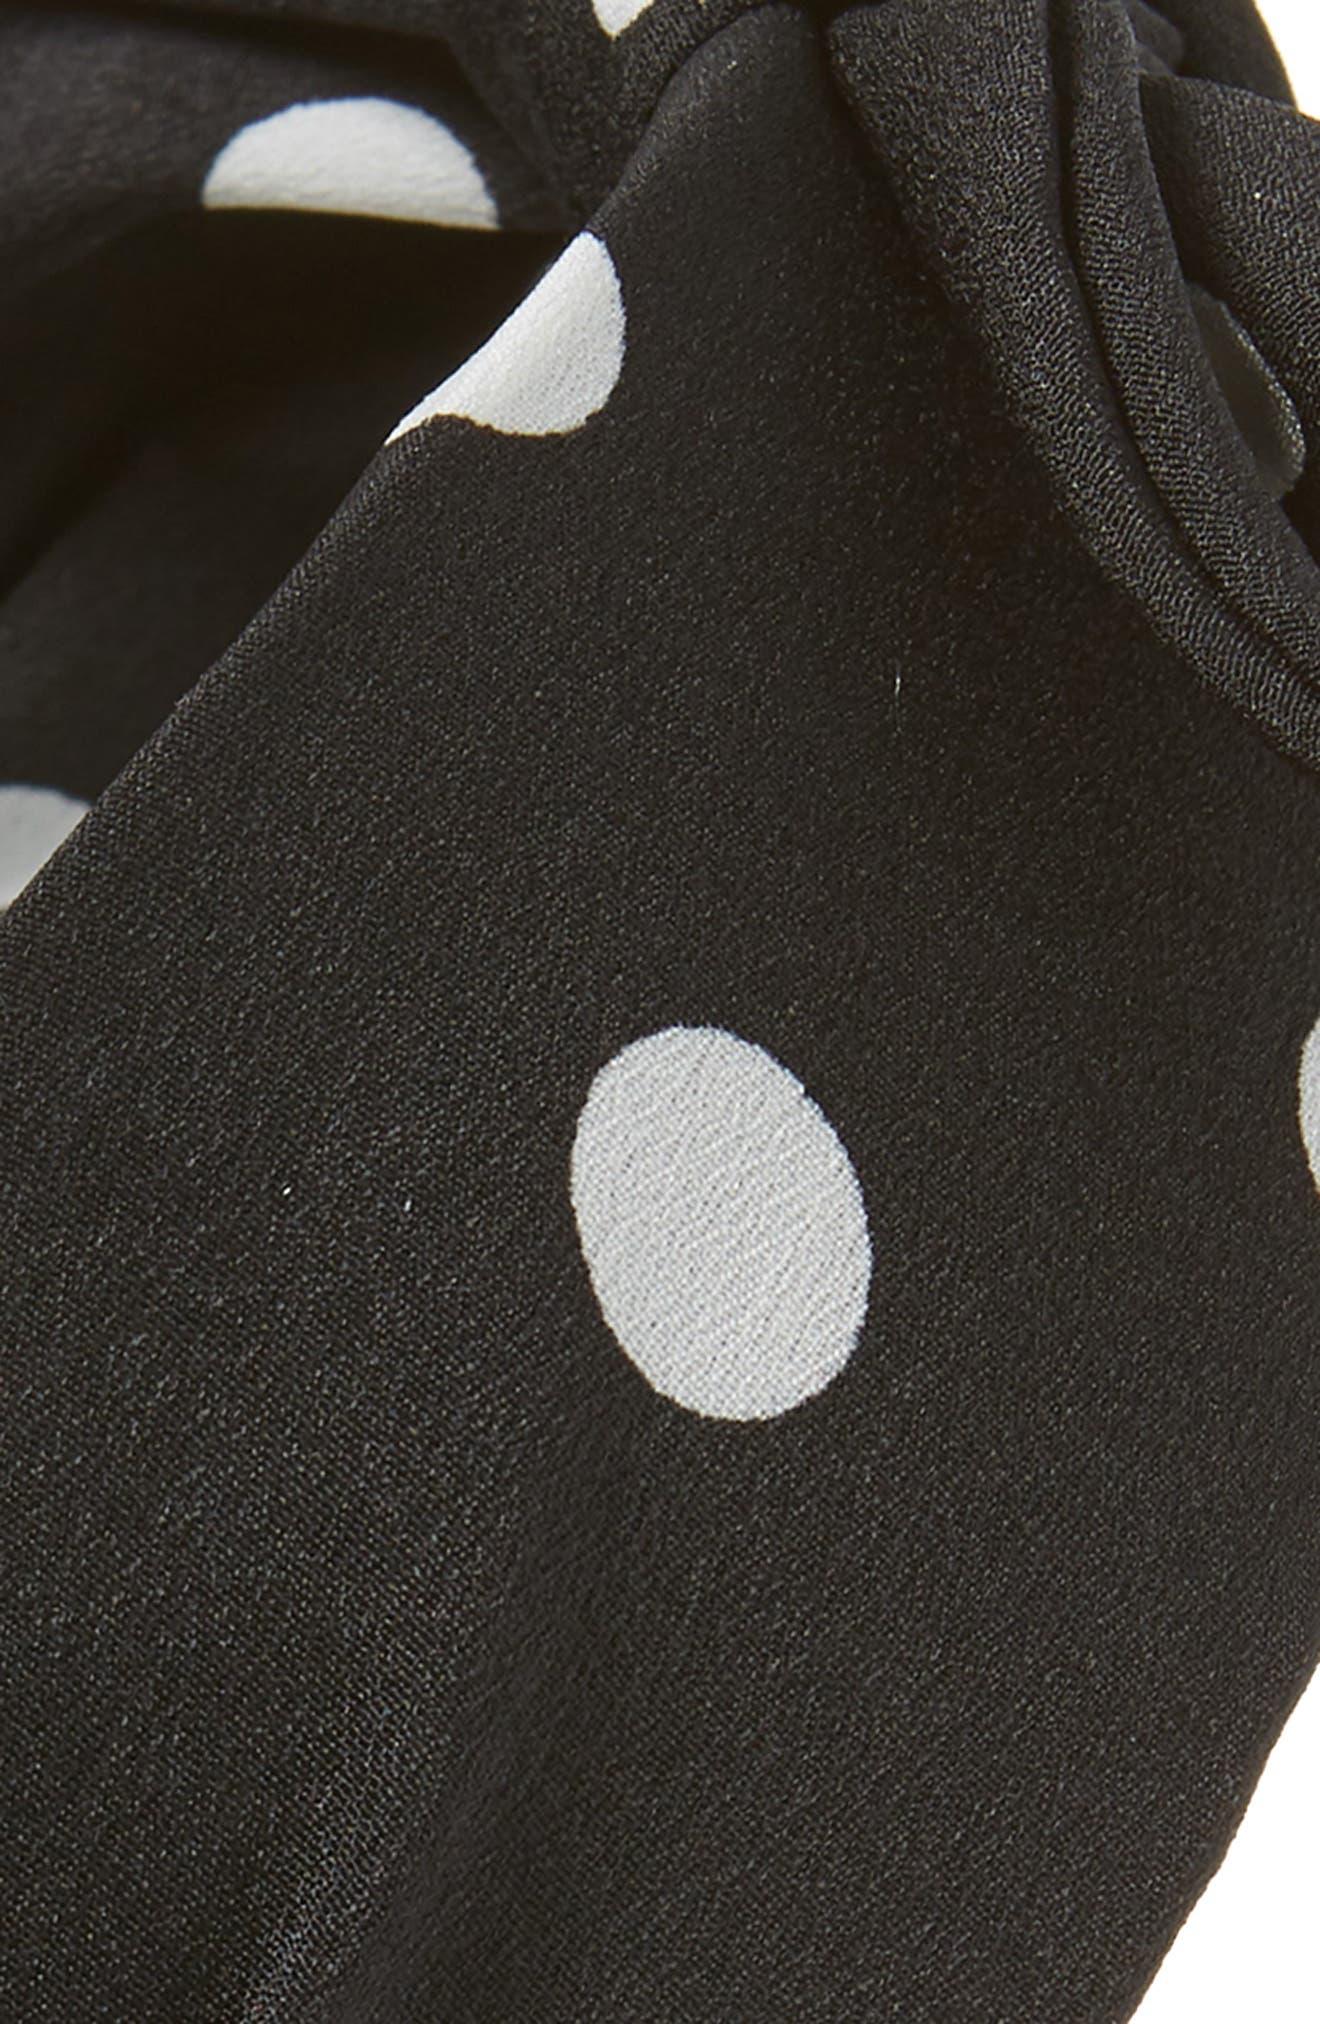 TASHA, Polka Dot Bow Headband, Alternate thumbnail 2, color, BLACK